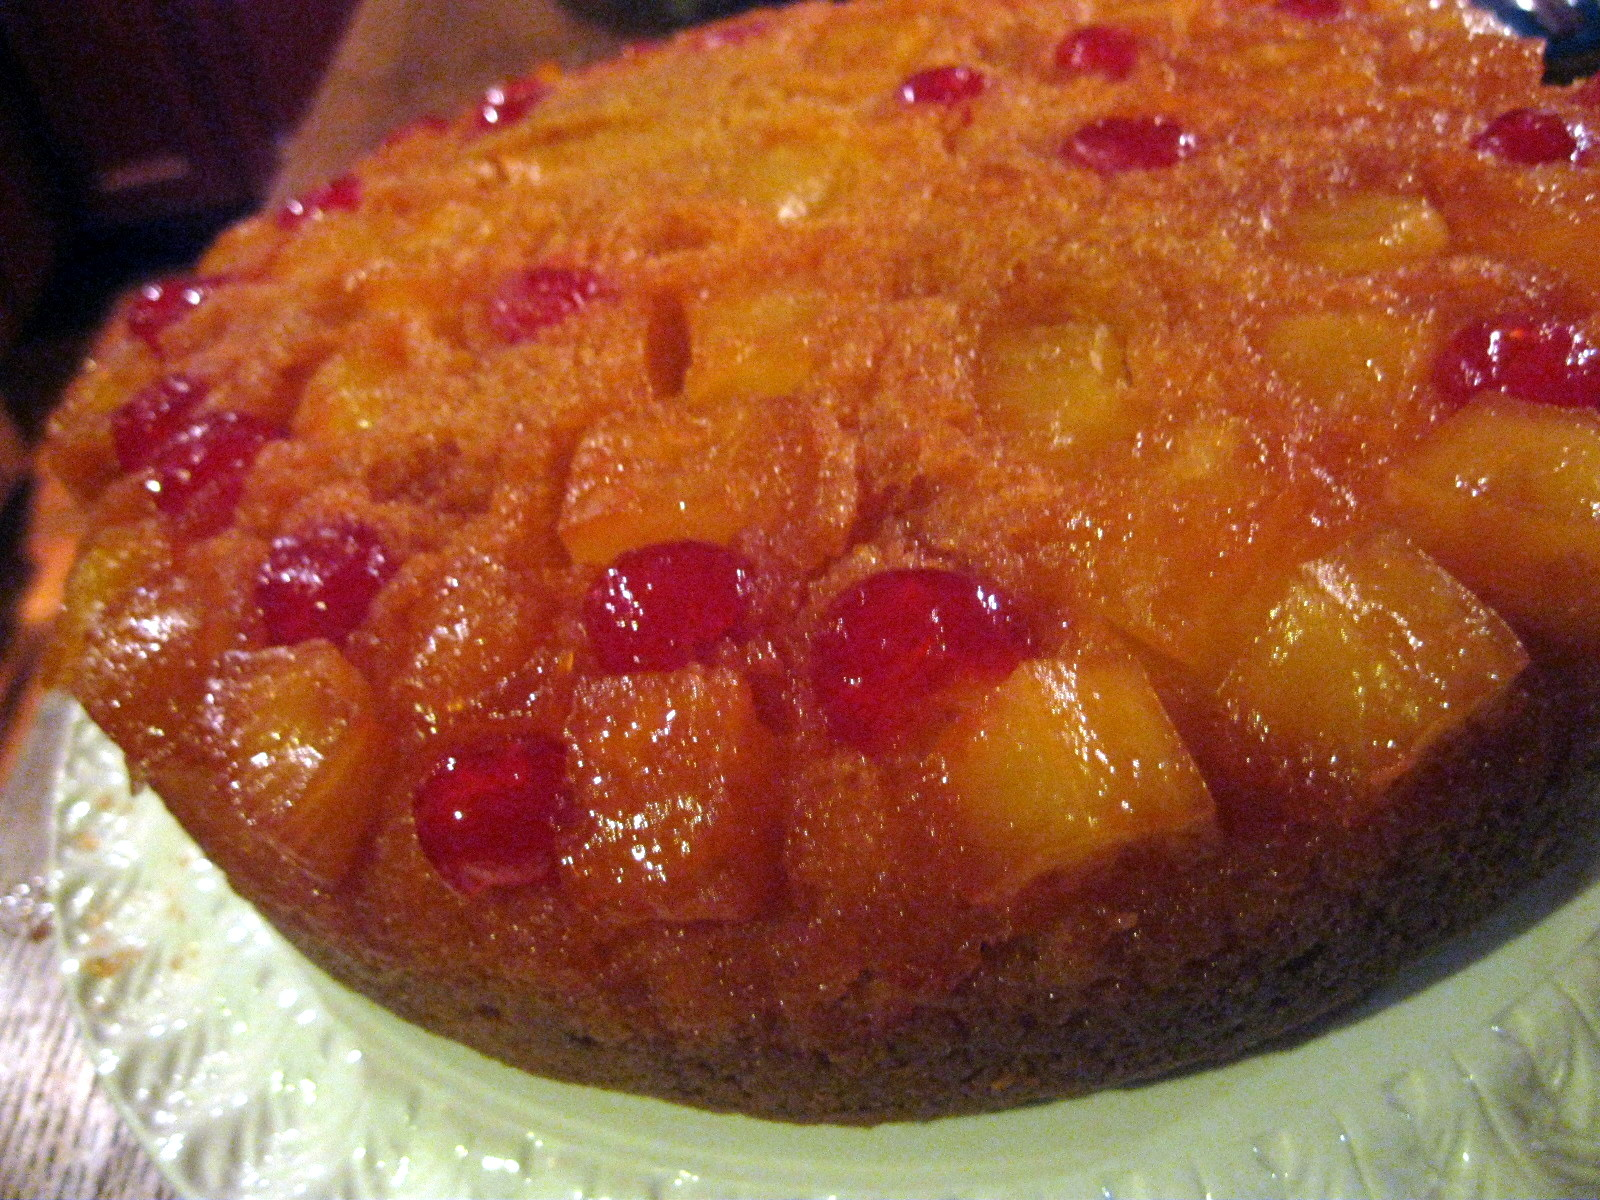 Adirondack Baker Chunky Pineapple Upside Down Cake